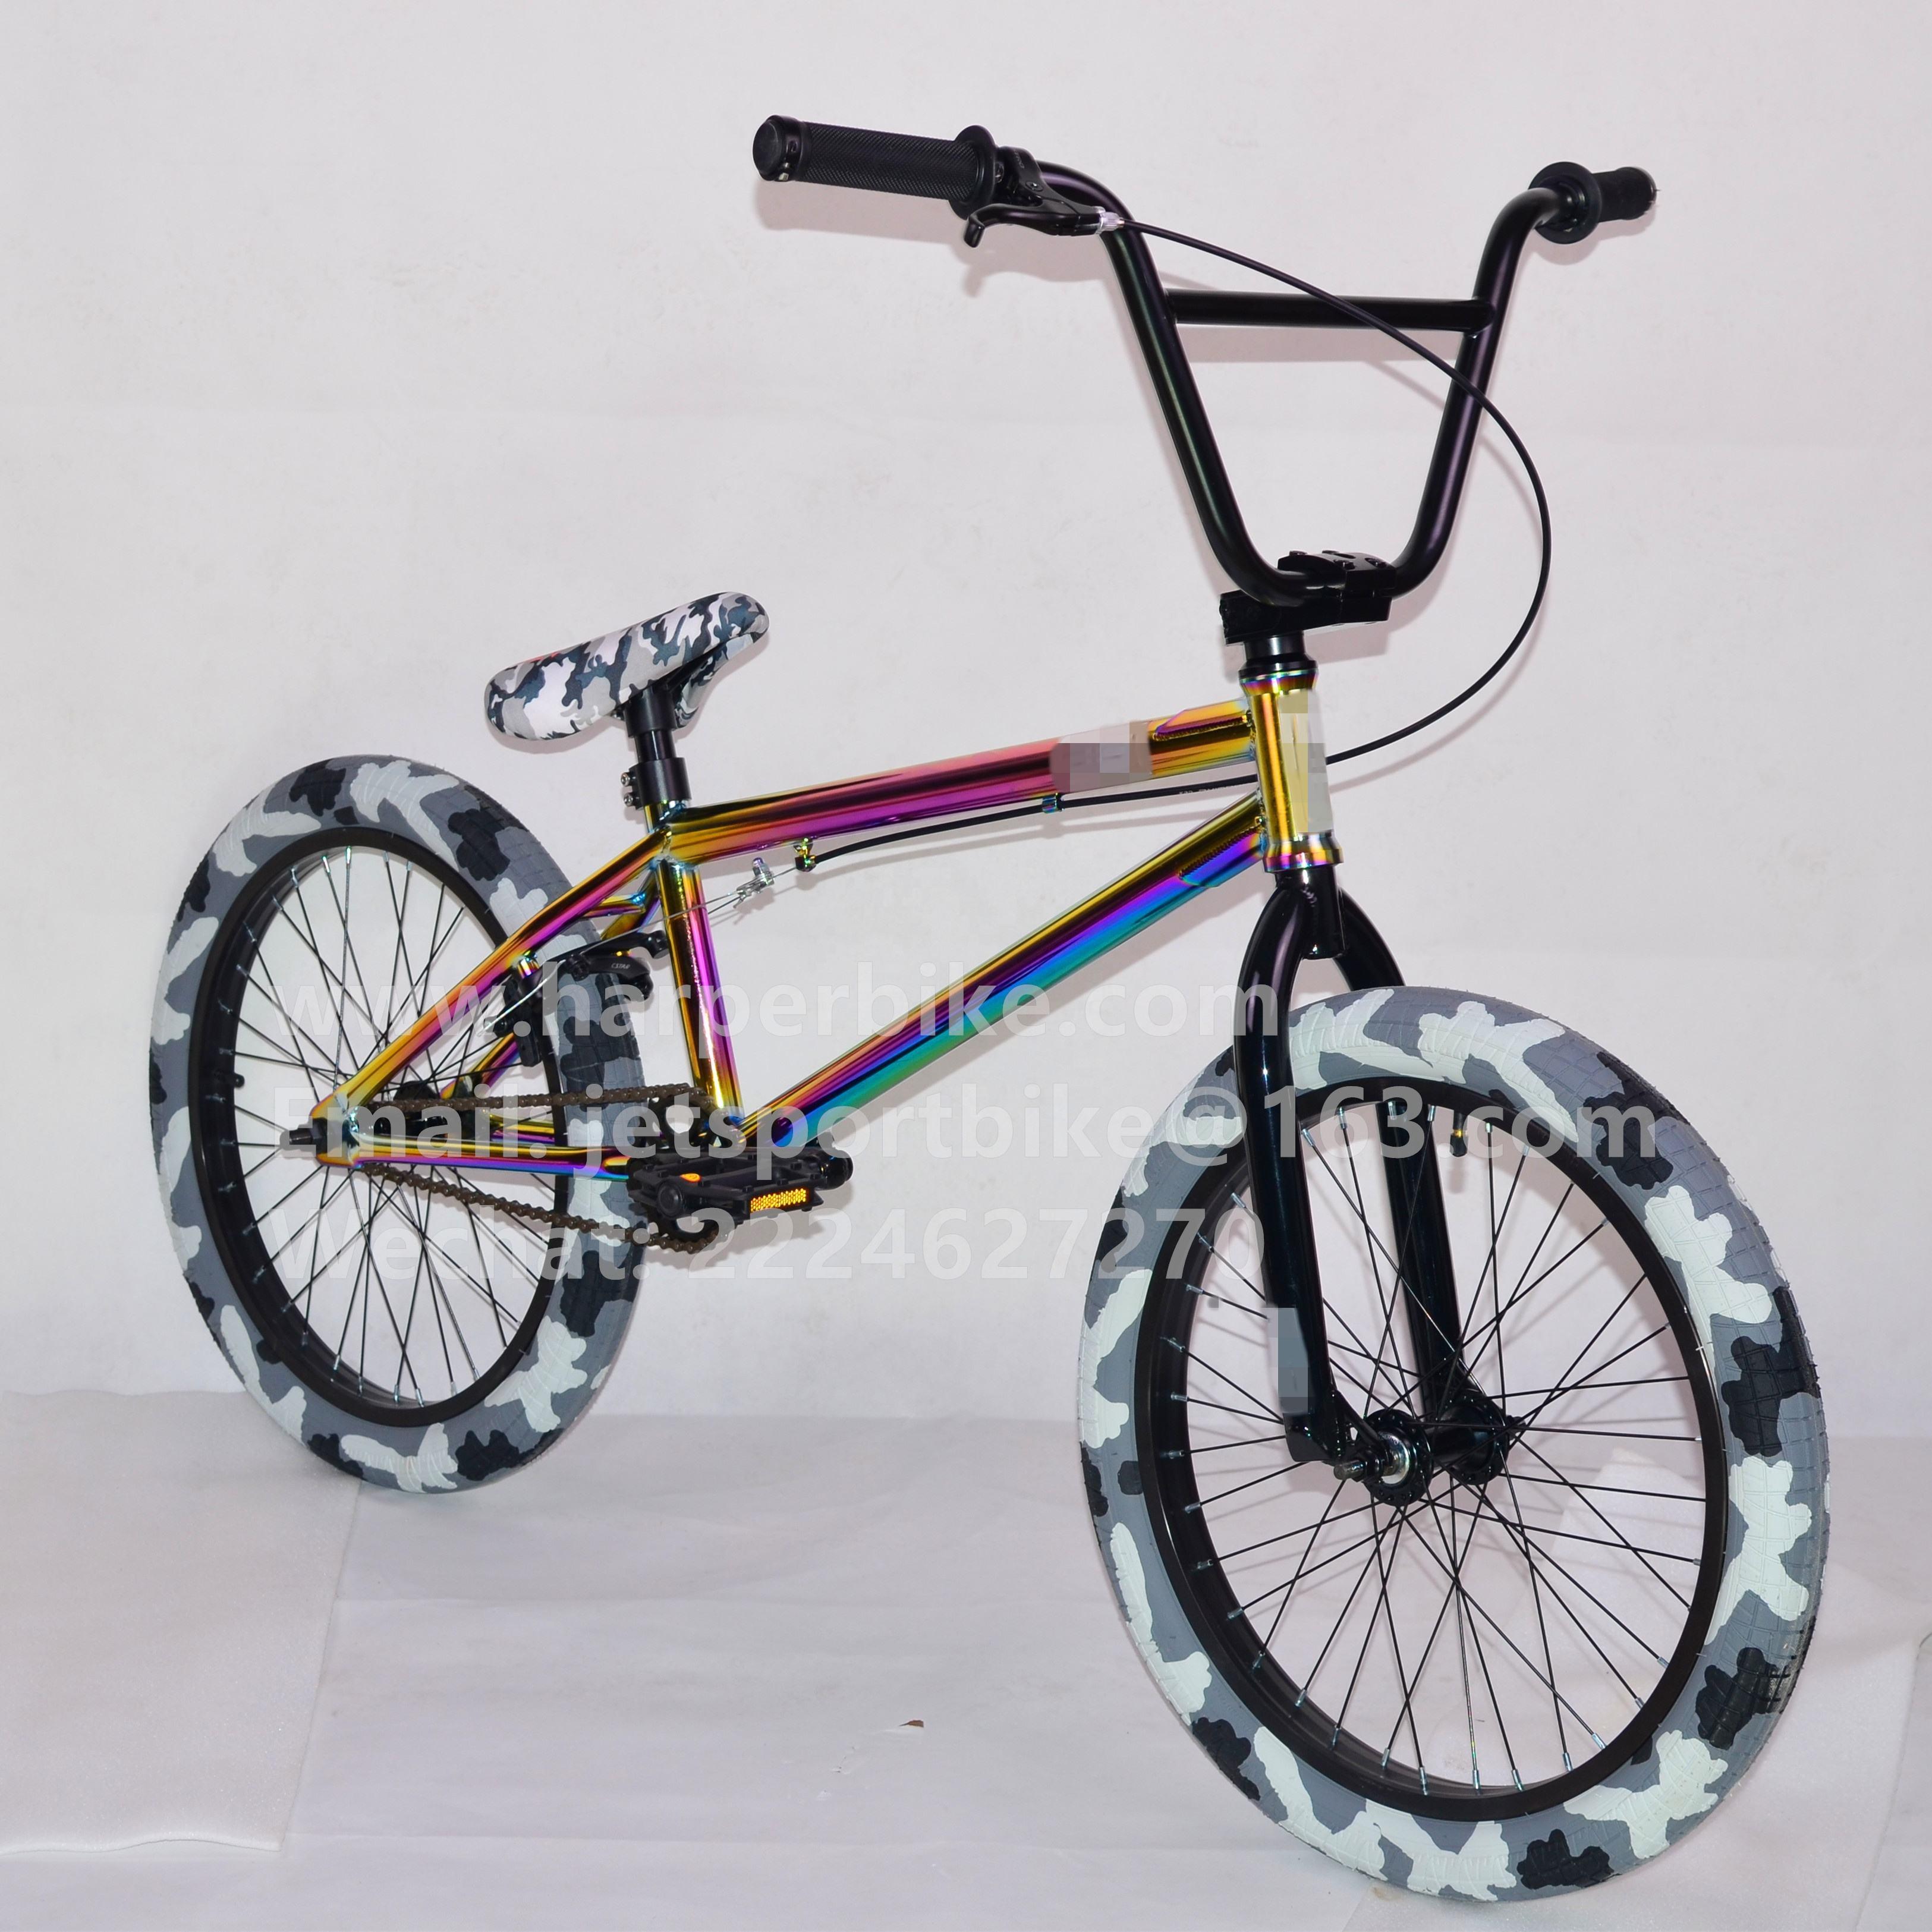 BICYCLE BOTTOM BRACKET SET 3 PCS CRANK 1.37 X 24T